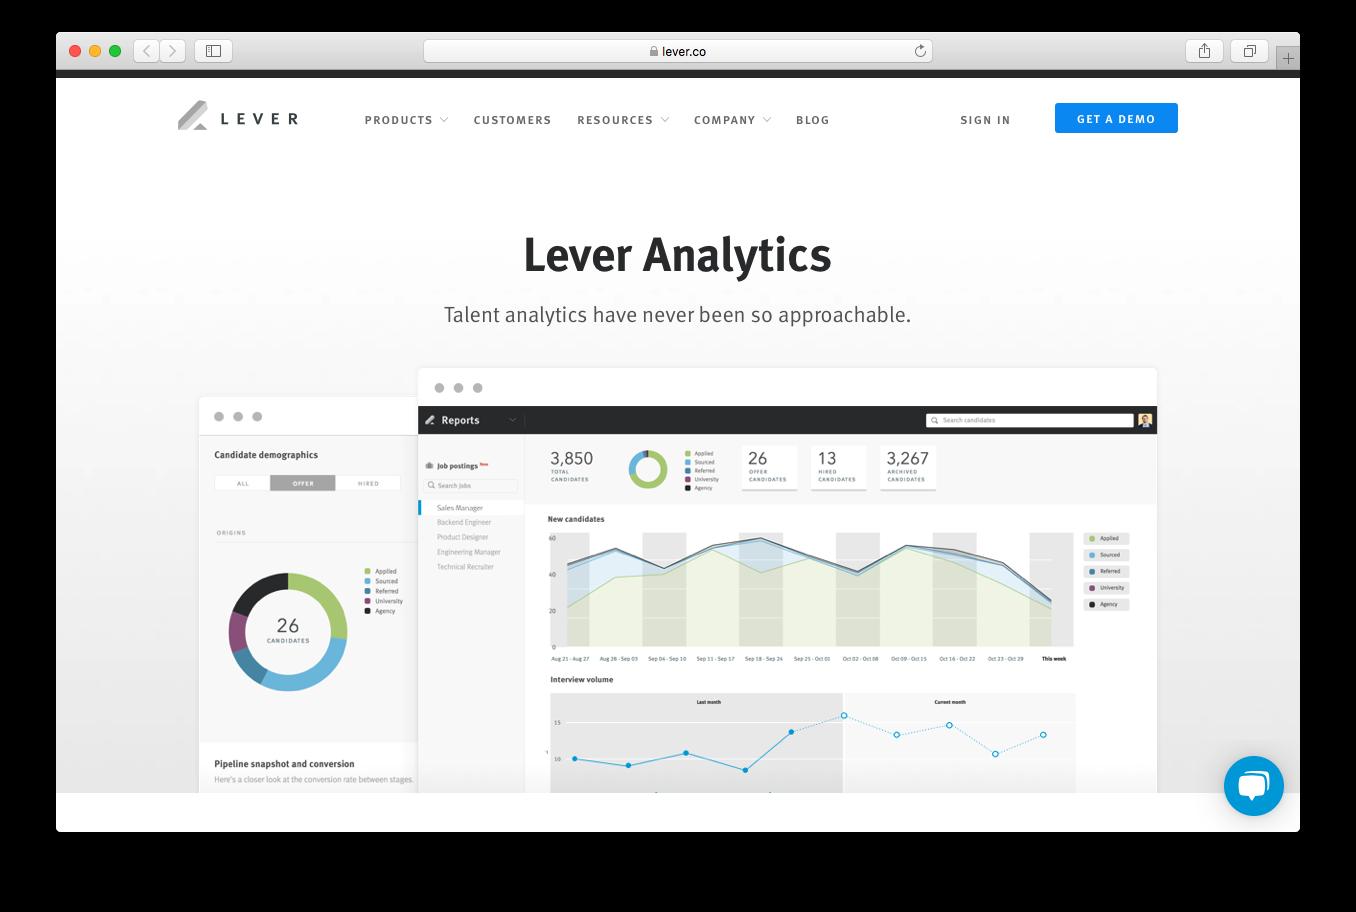 Lever analytics talent reports demographics pipeline